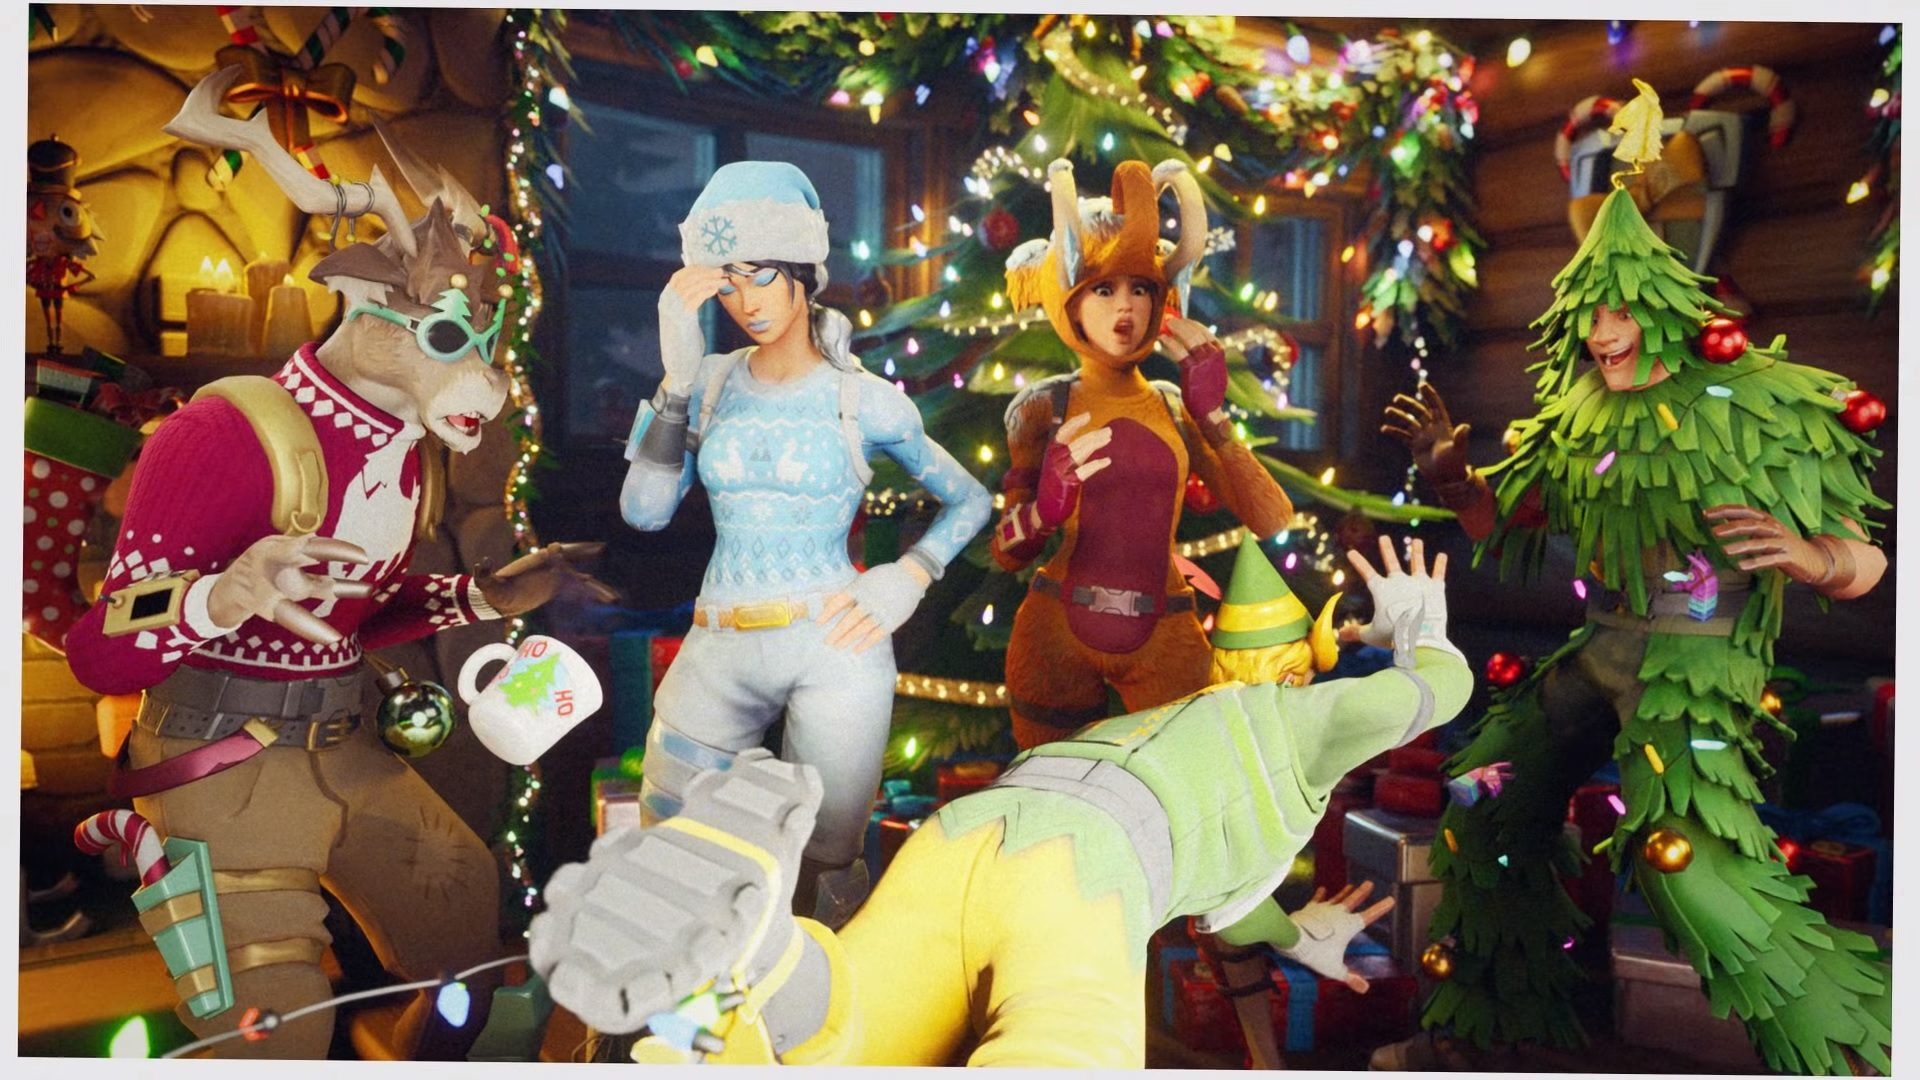 Navidad - www.culturageek.com.ar